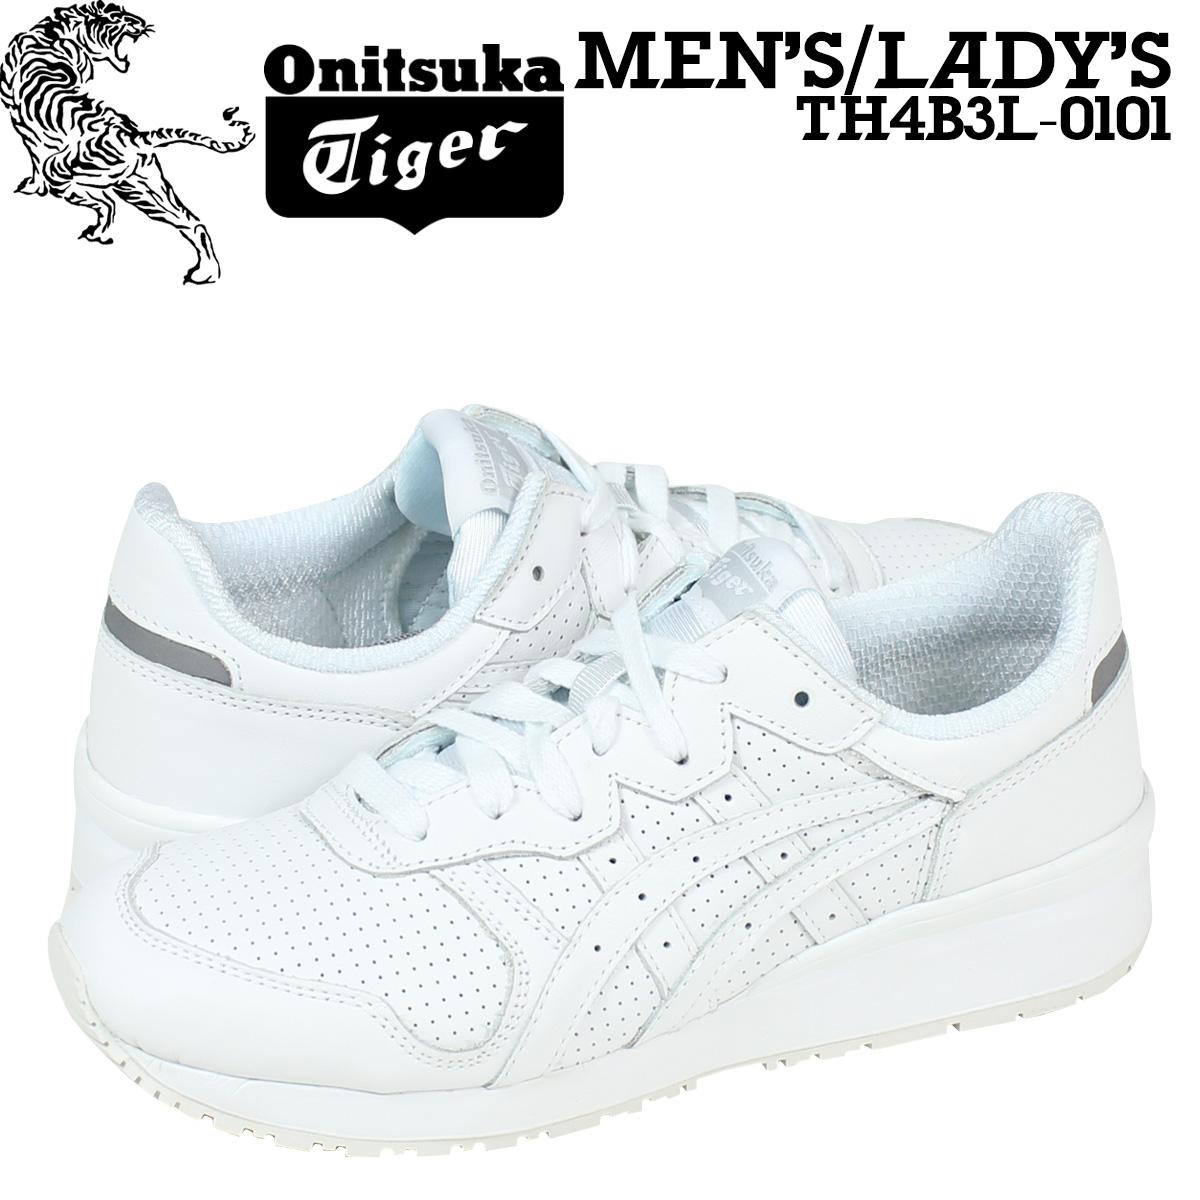 7cd475926f54 Onitsuka Tiger ASICs Onitsuka Tiger asics Tiger Alliance sneakers TIGER  ALLIANCE TH4B 3L-0101 men s women s shoes white